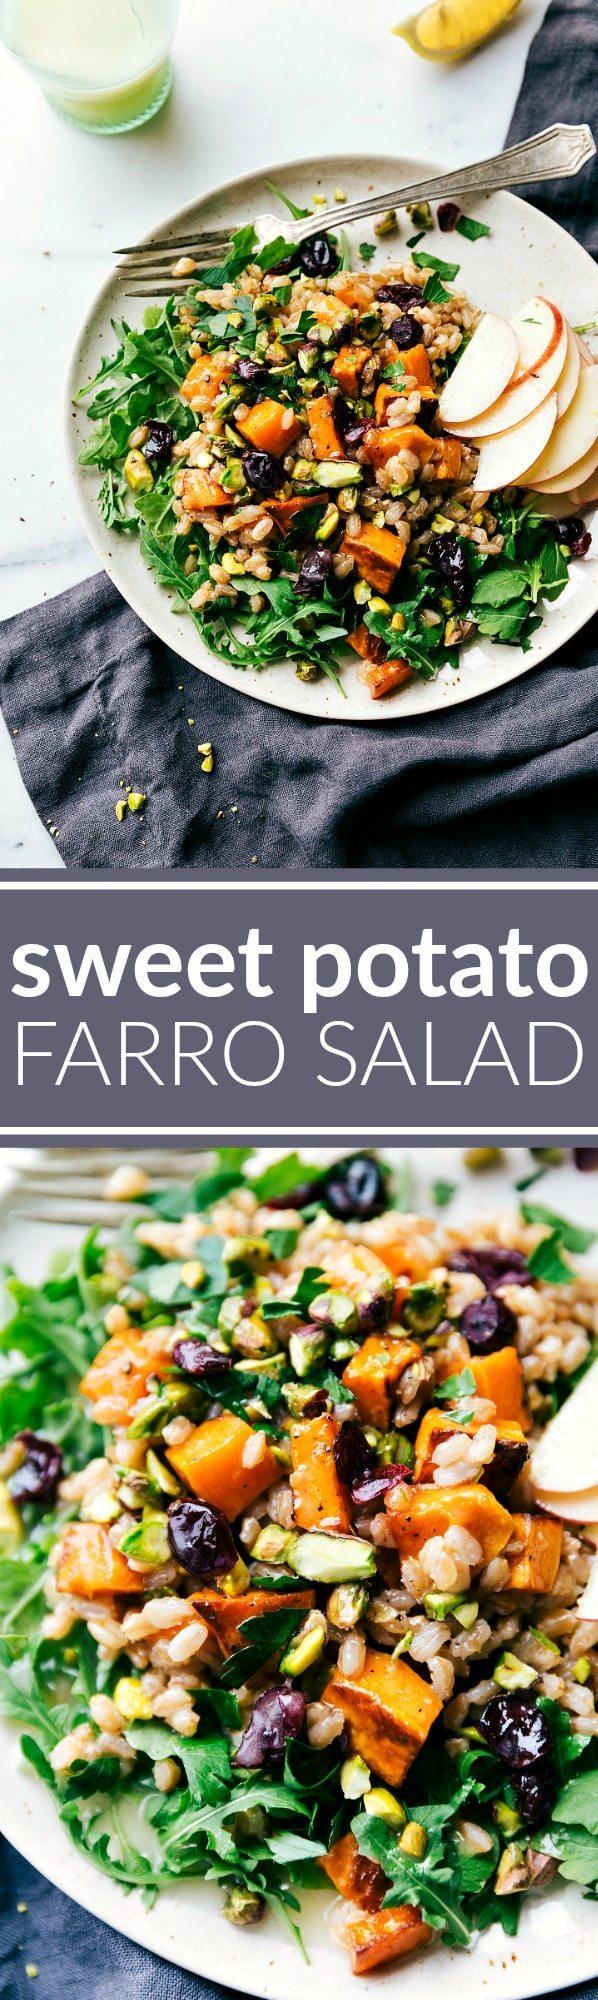 ROASTED SWEET POTATO SALAD. A hearty, healthy, and filling salad -- sweet apple cider farro, roasted sweet potatoes, arugula, and an easy blender lemon dressing. via chelseasmessyapron.com